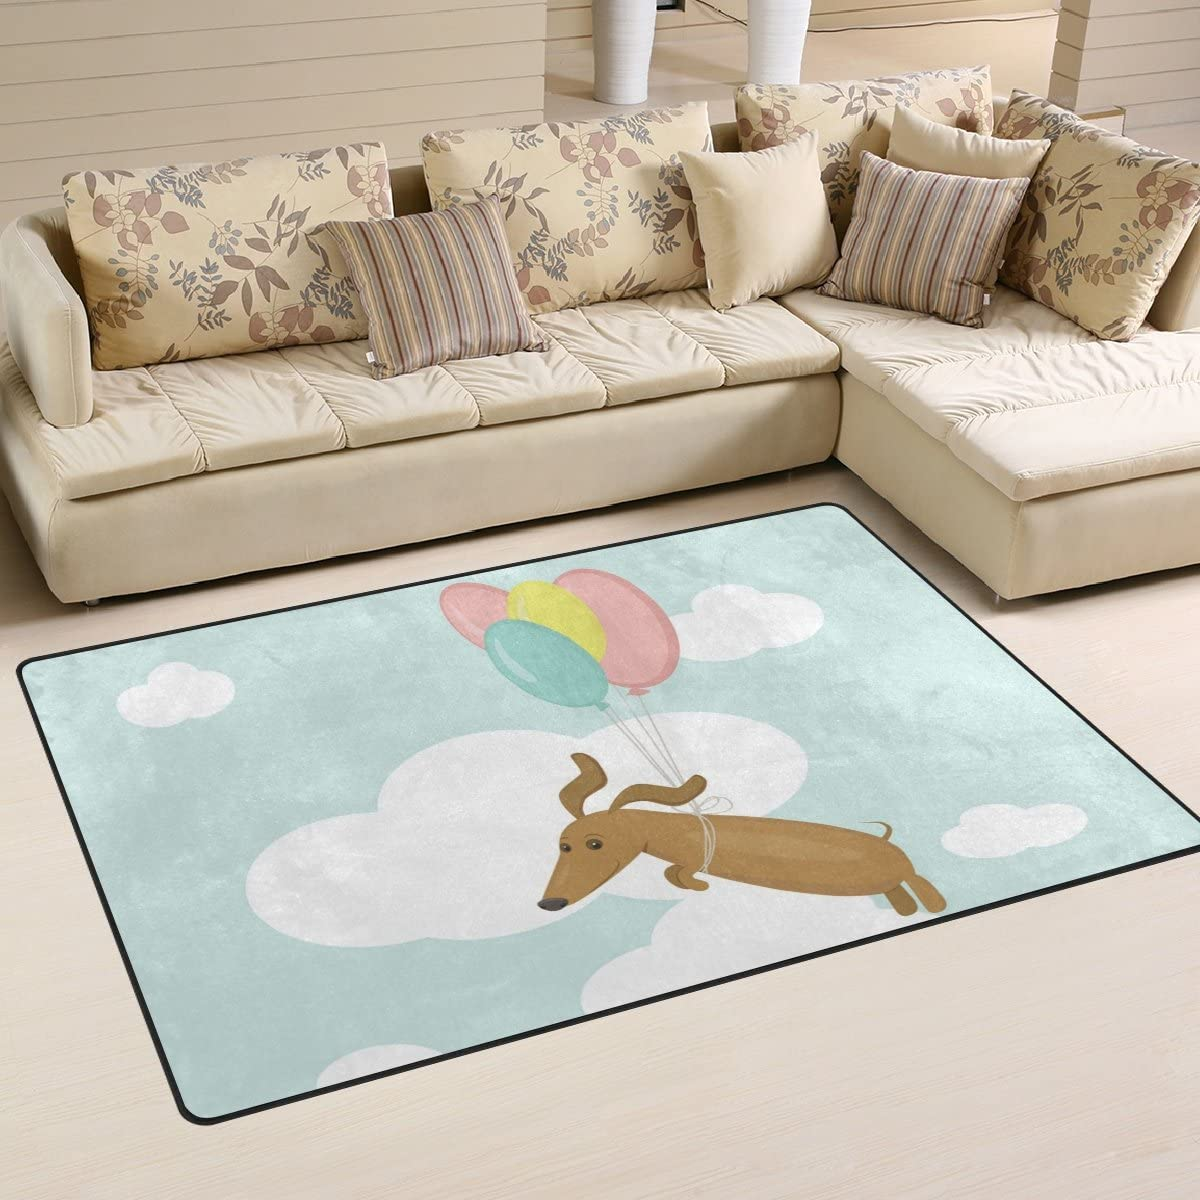 Yochoice Non-slip Area Rugs Home Decor, Stylish Funny Flying Dachshund Dog Blue Sky Balloon Floor Mat Living Room Bedroom Carpets Doormats 60 x 39 inches